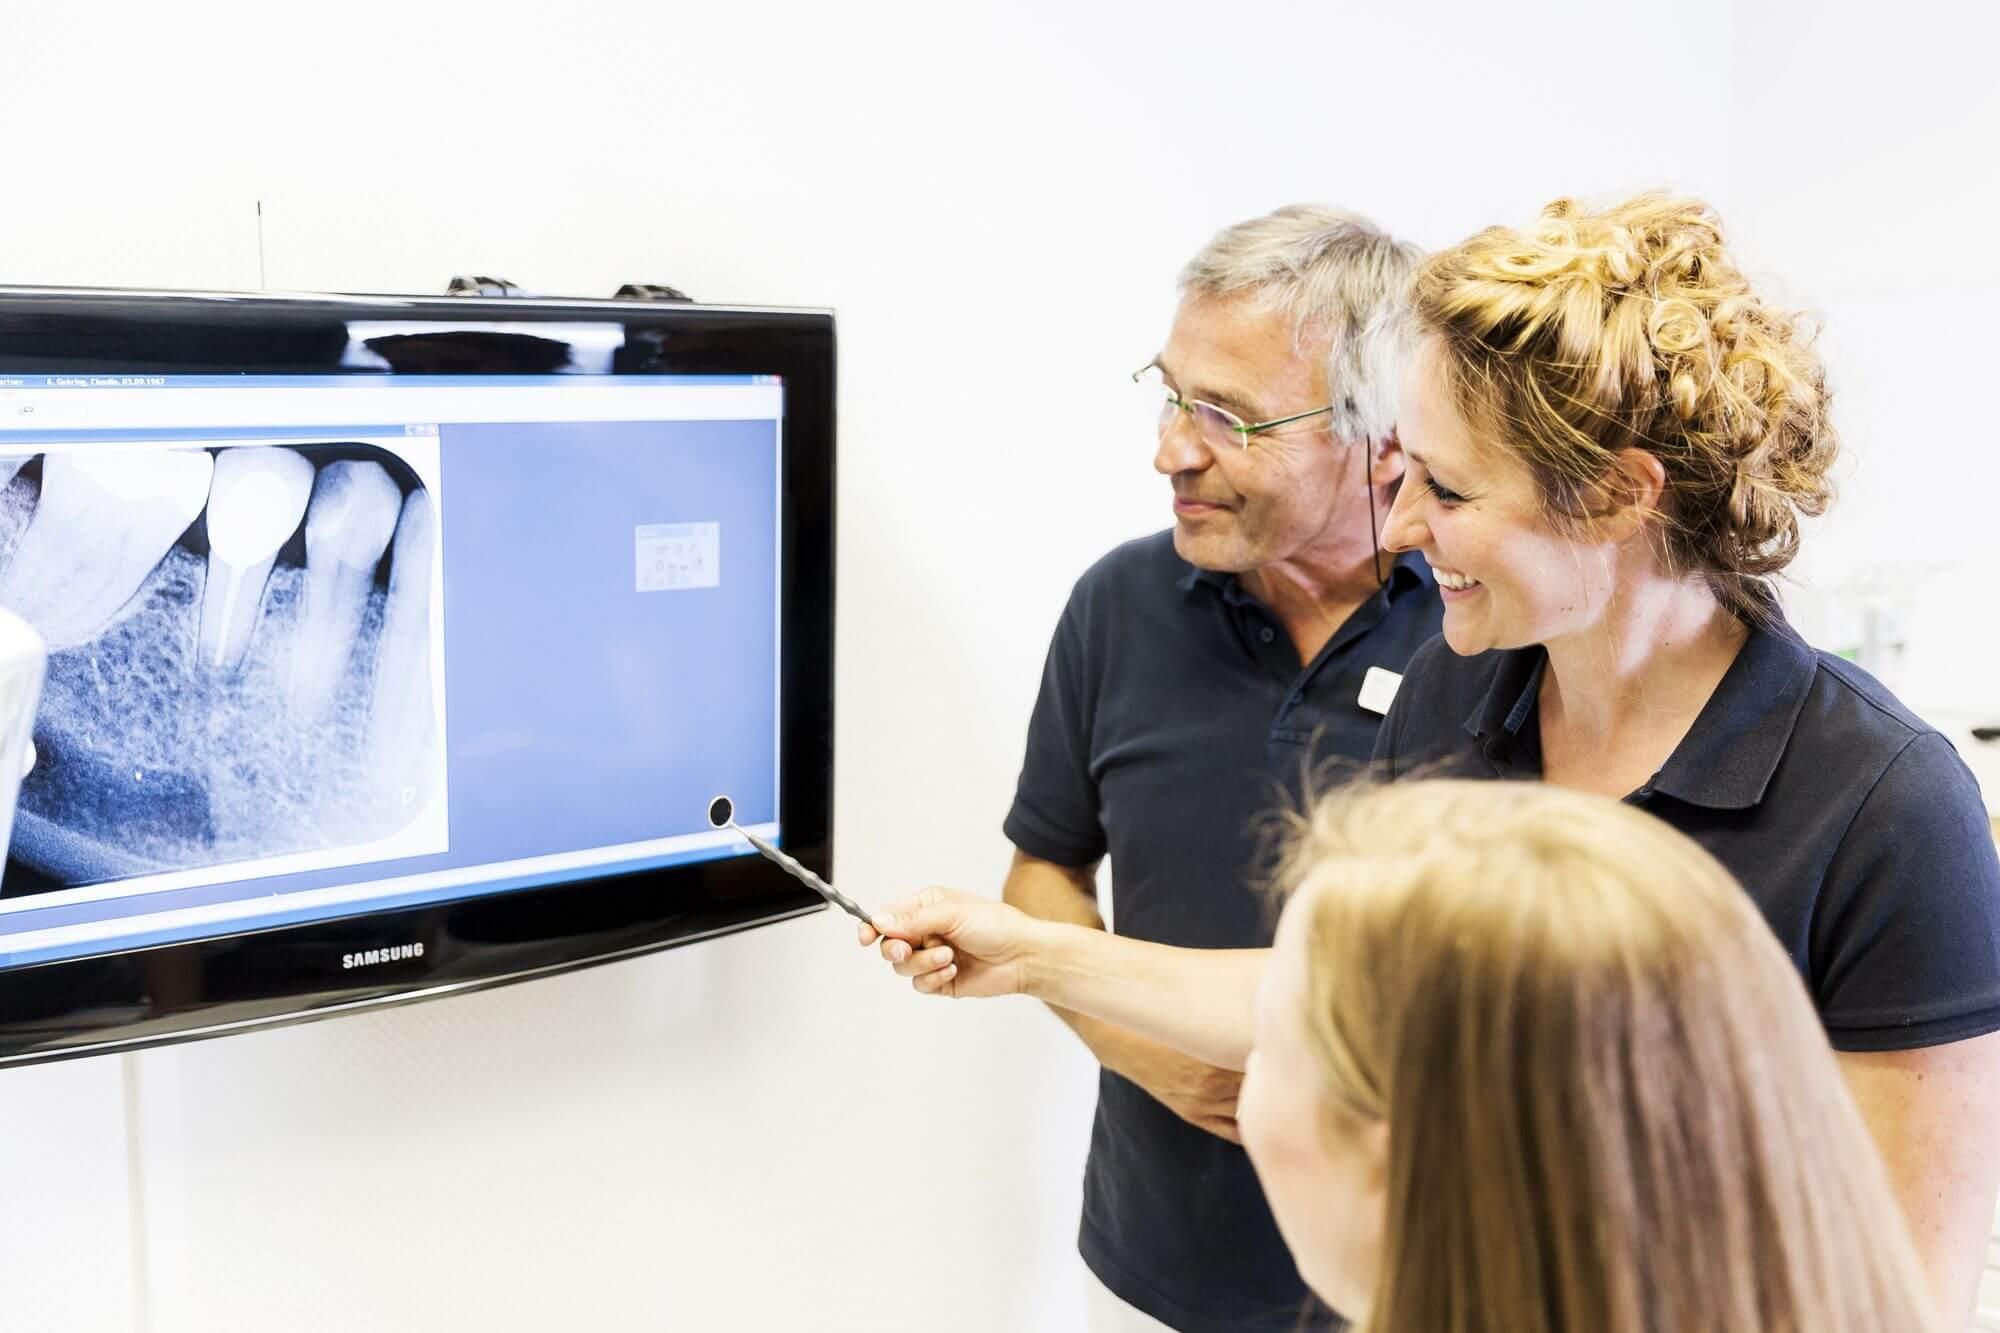 Besprechung des Zahnärzteteams vor Röntgenbild